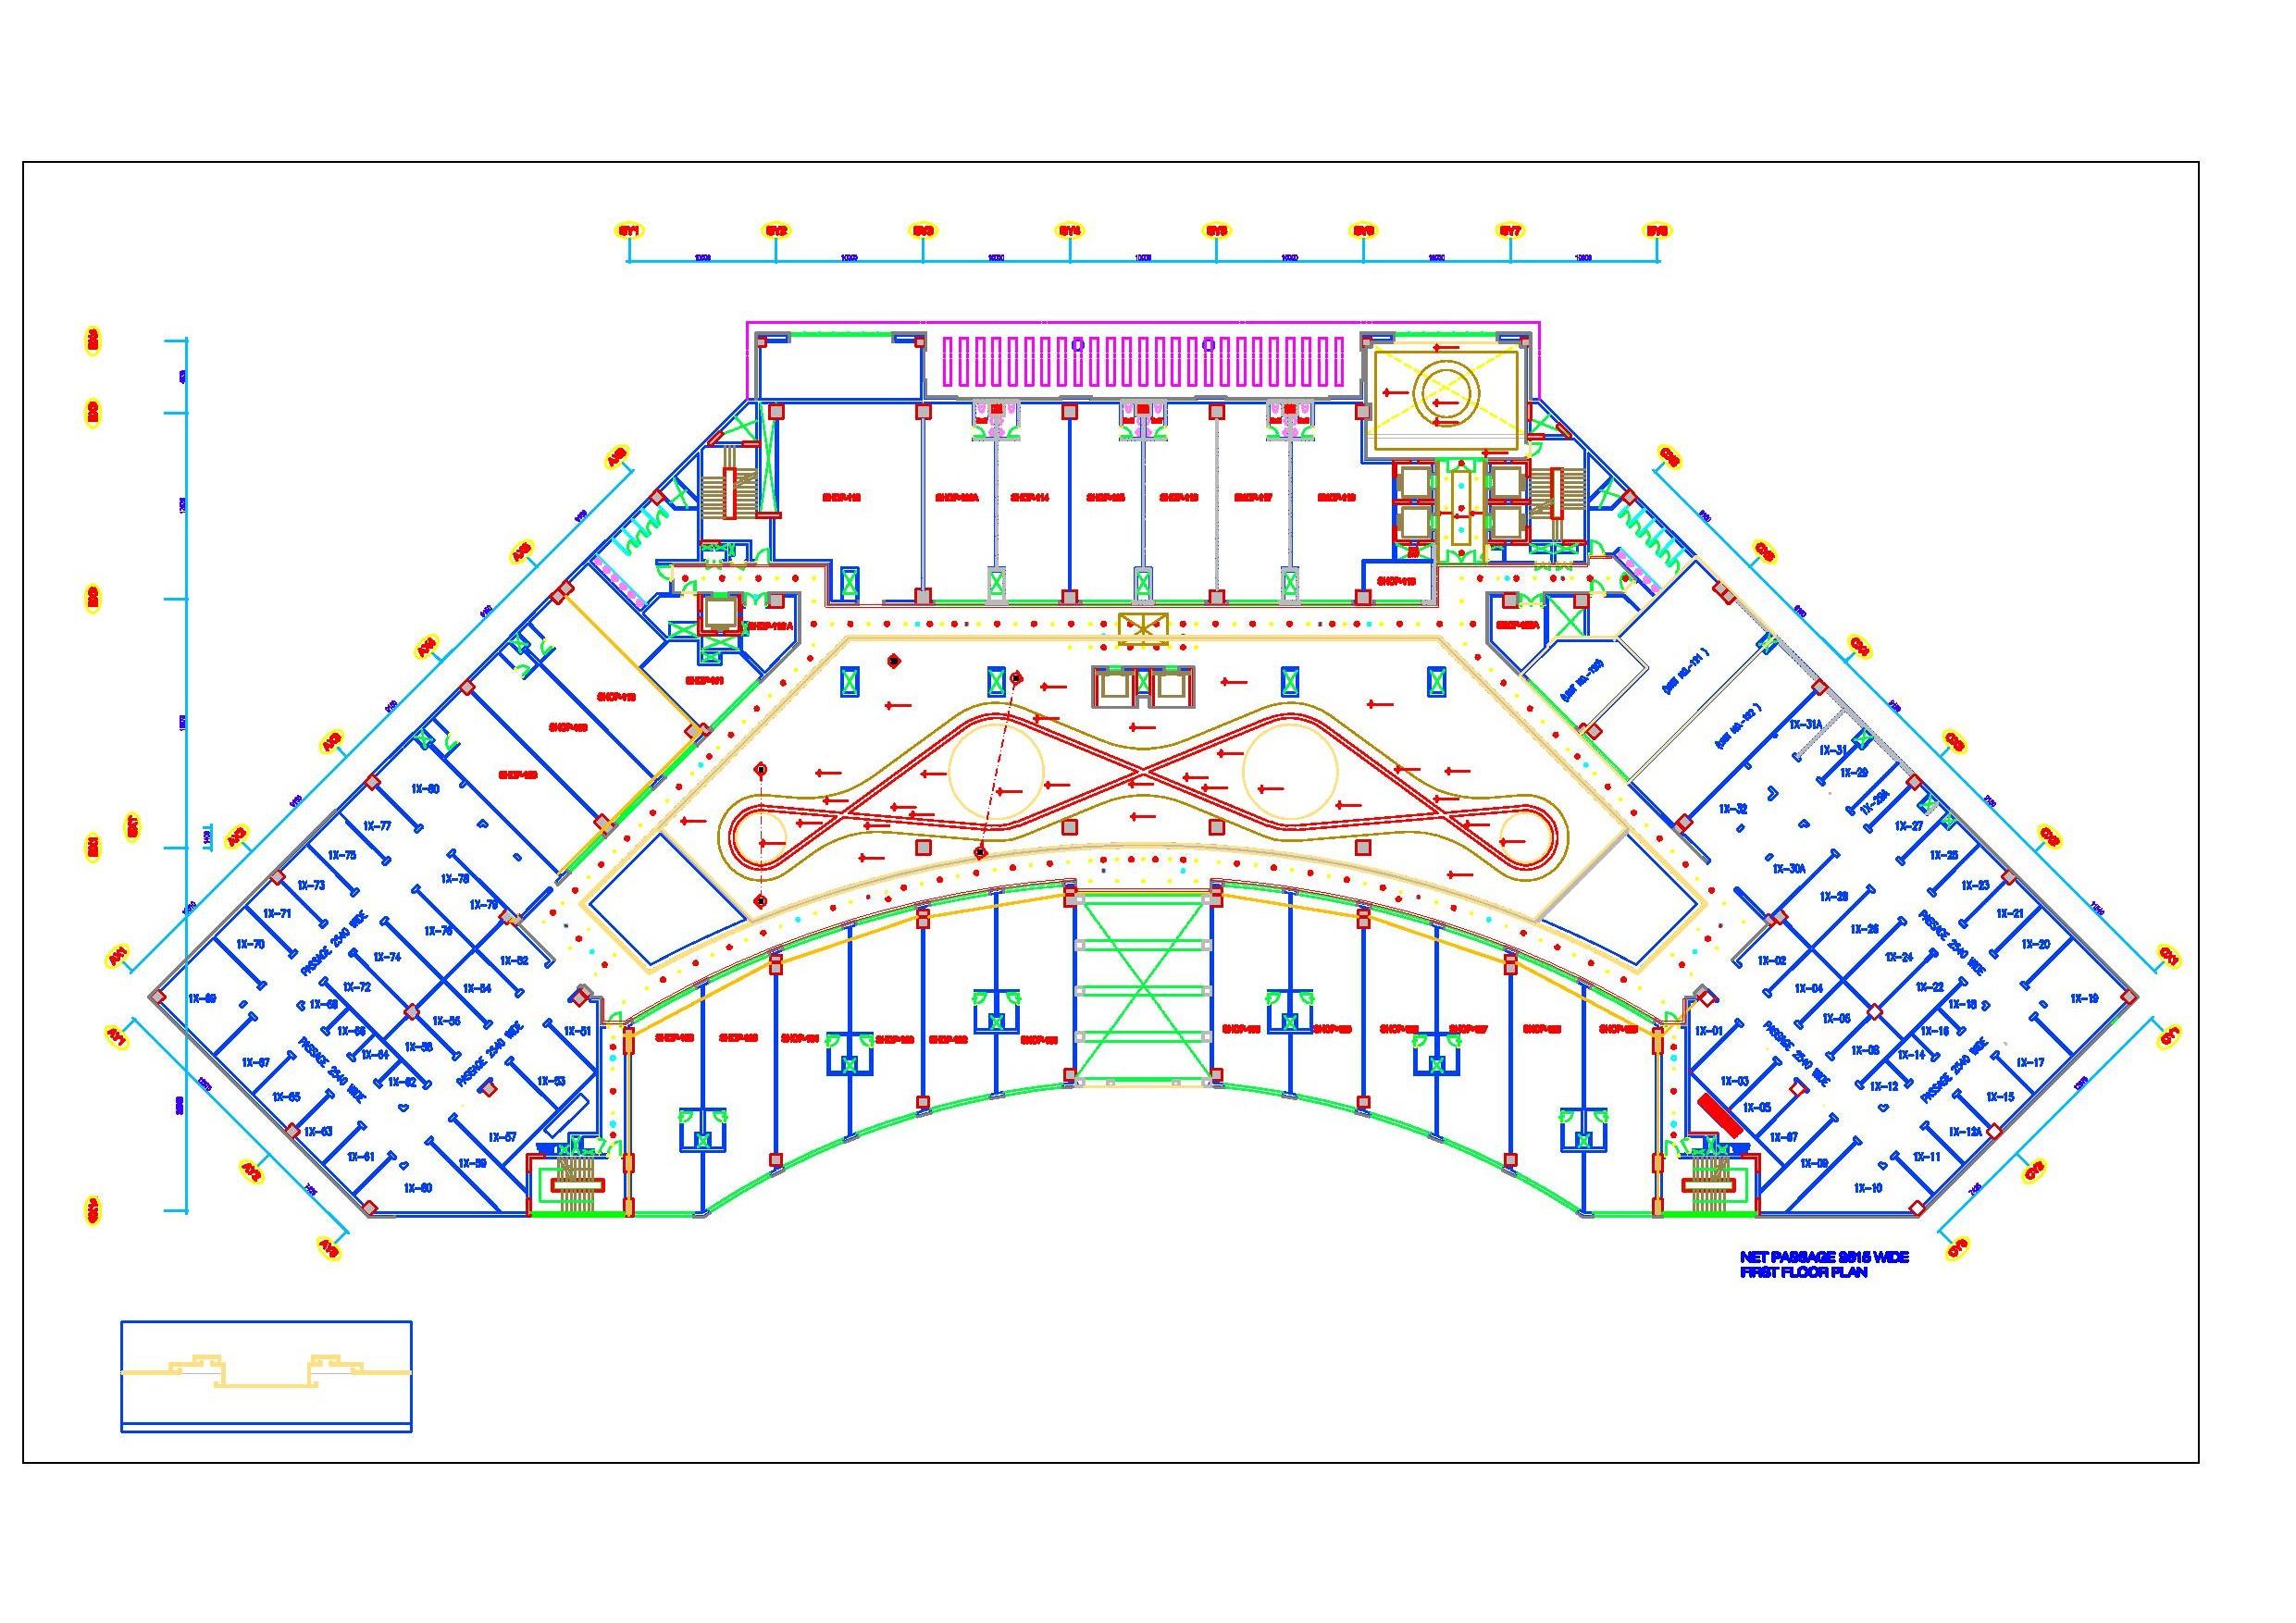 Target Center Floor Plan Ild Trade Centre Sohna Road Gurgaon